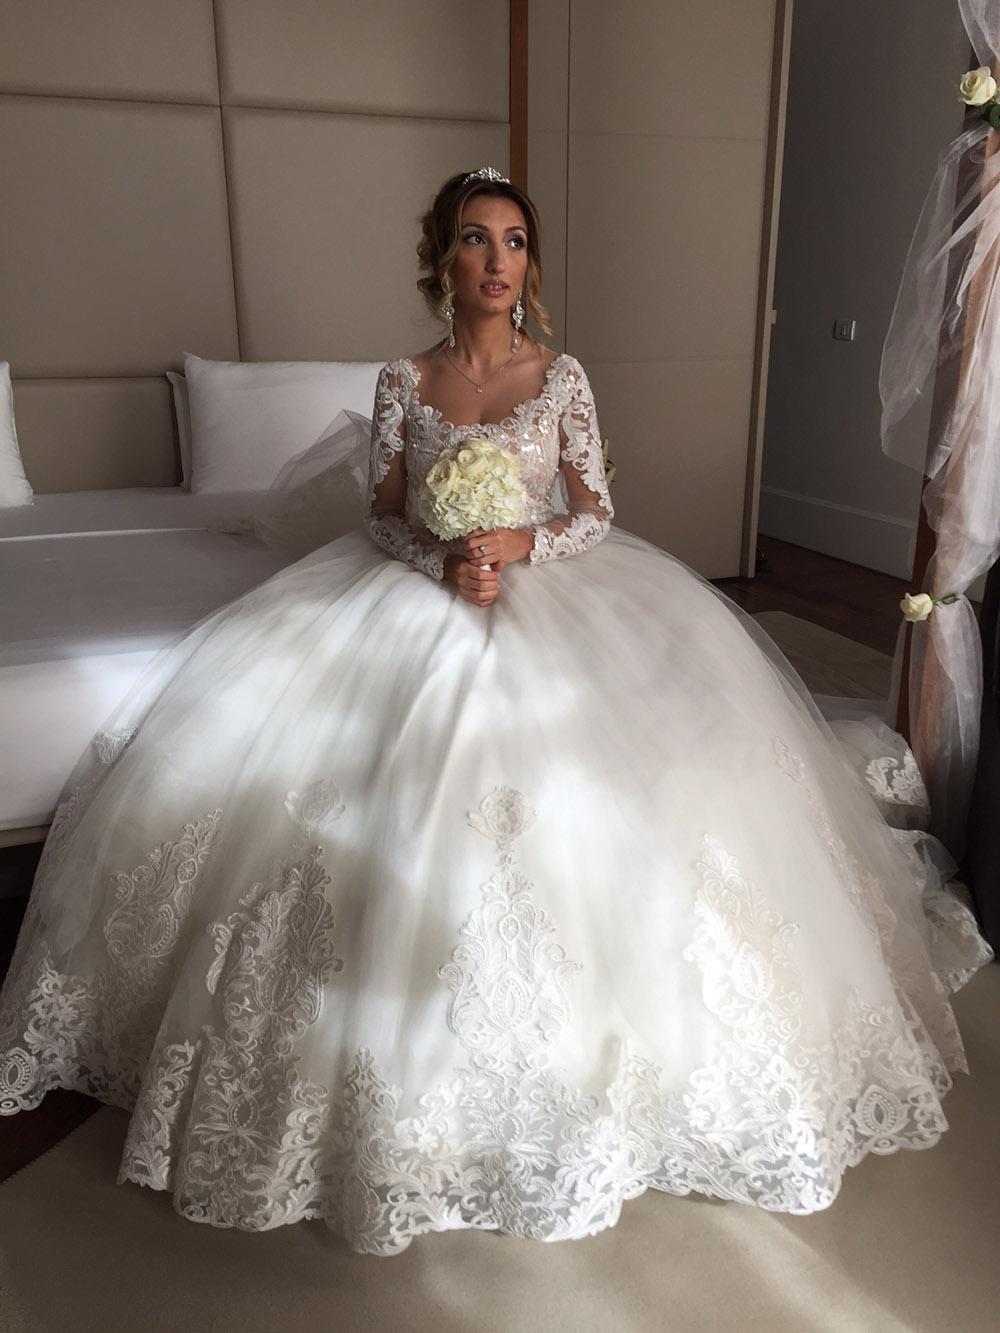 10-armenian-italian-wedding-in-rome-annartstyle-news.JPG